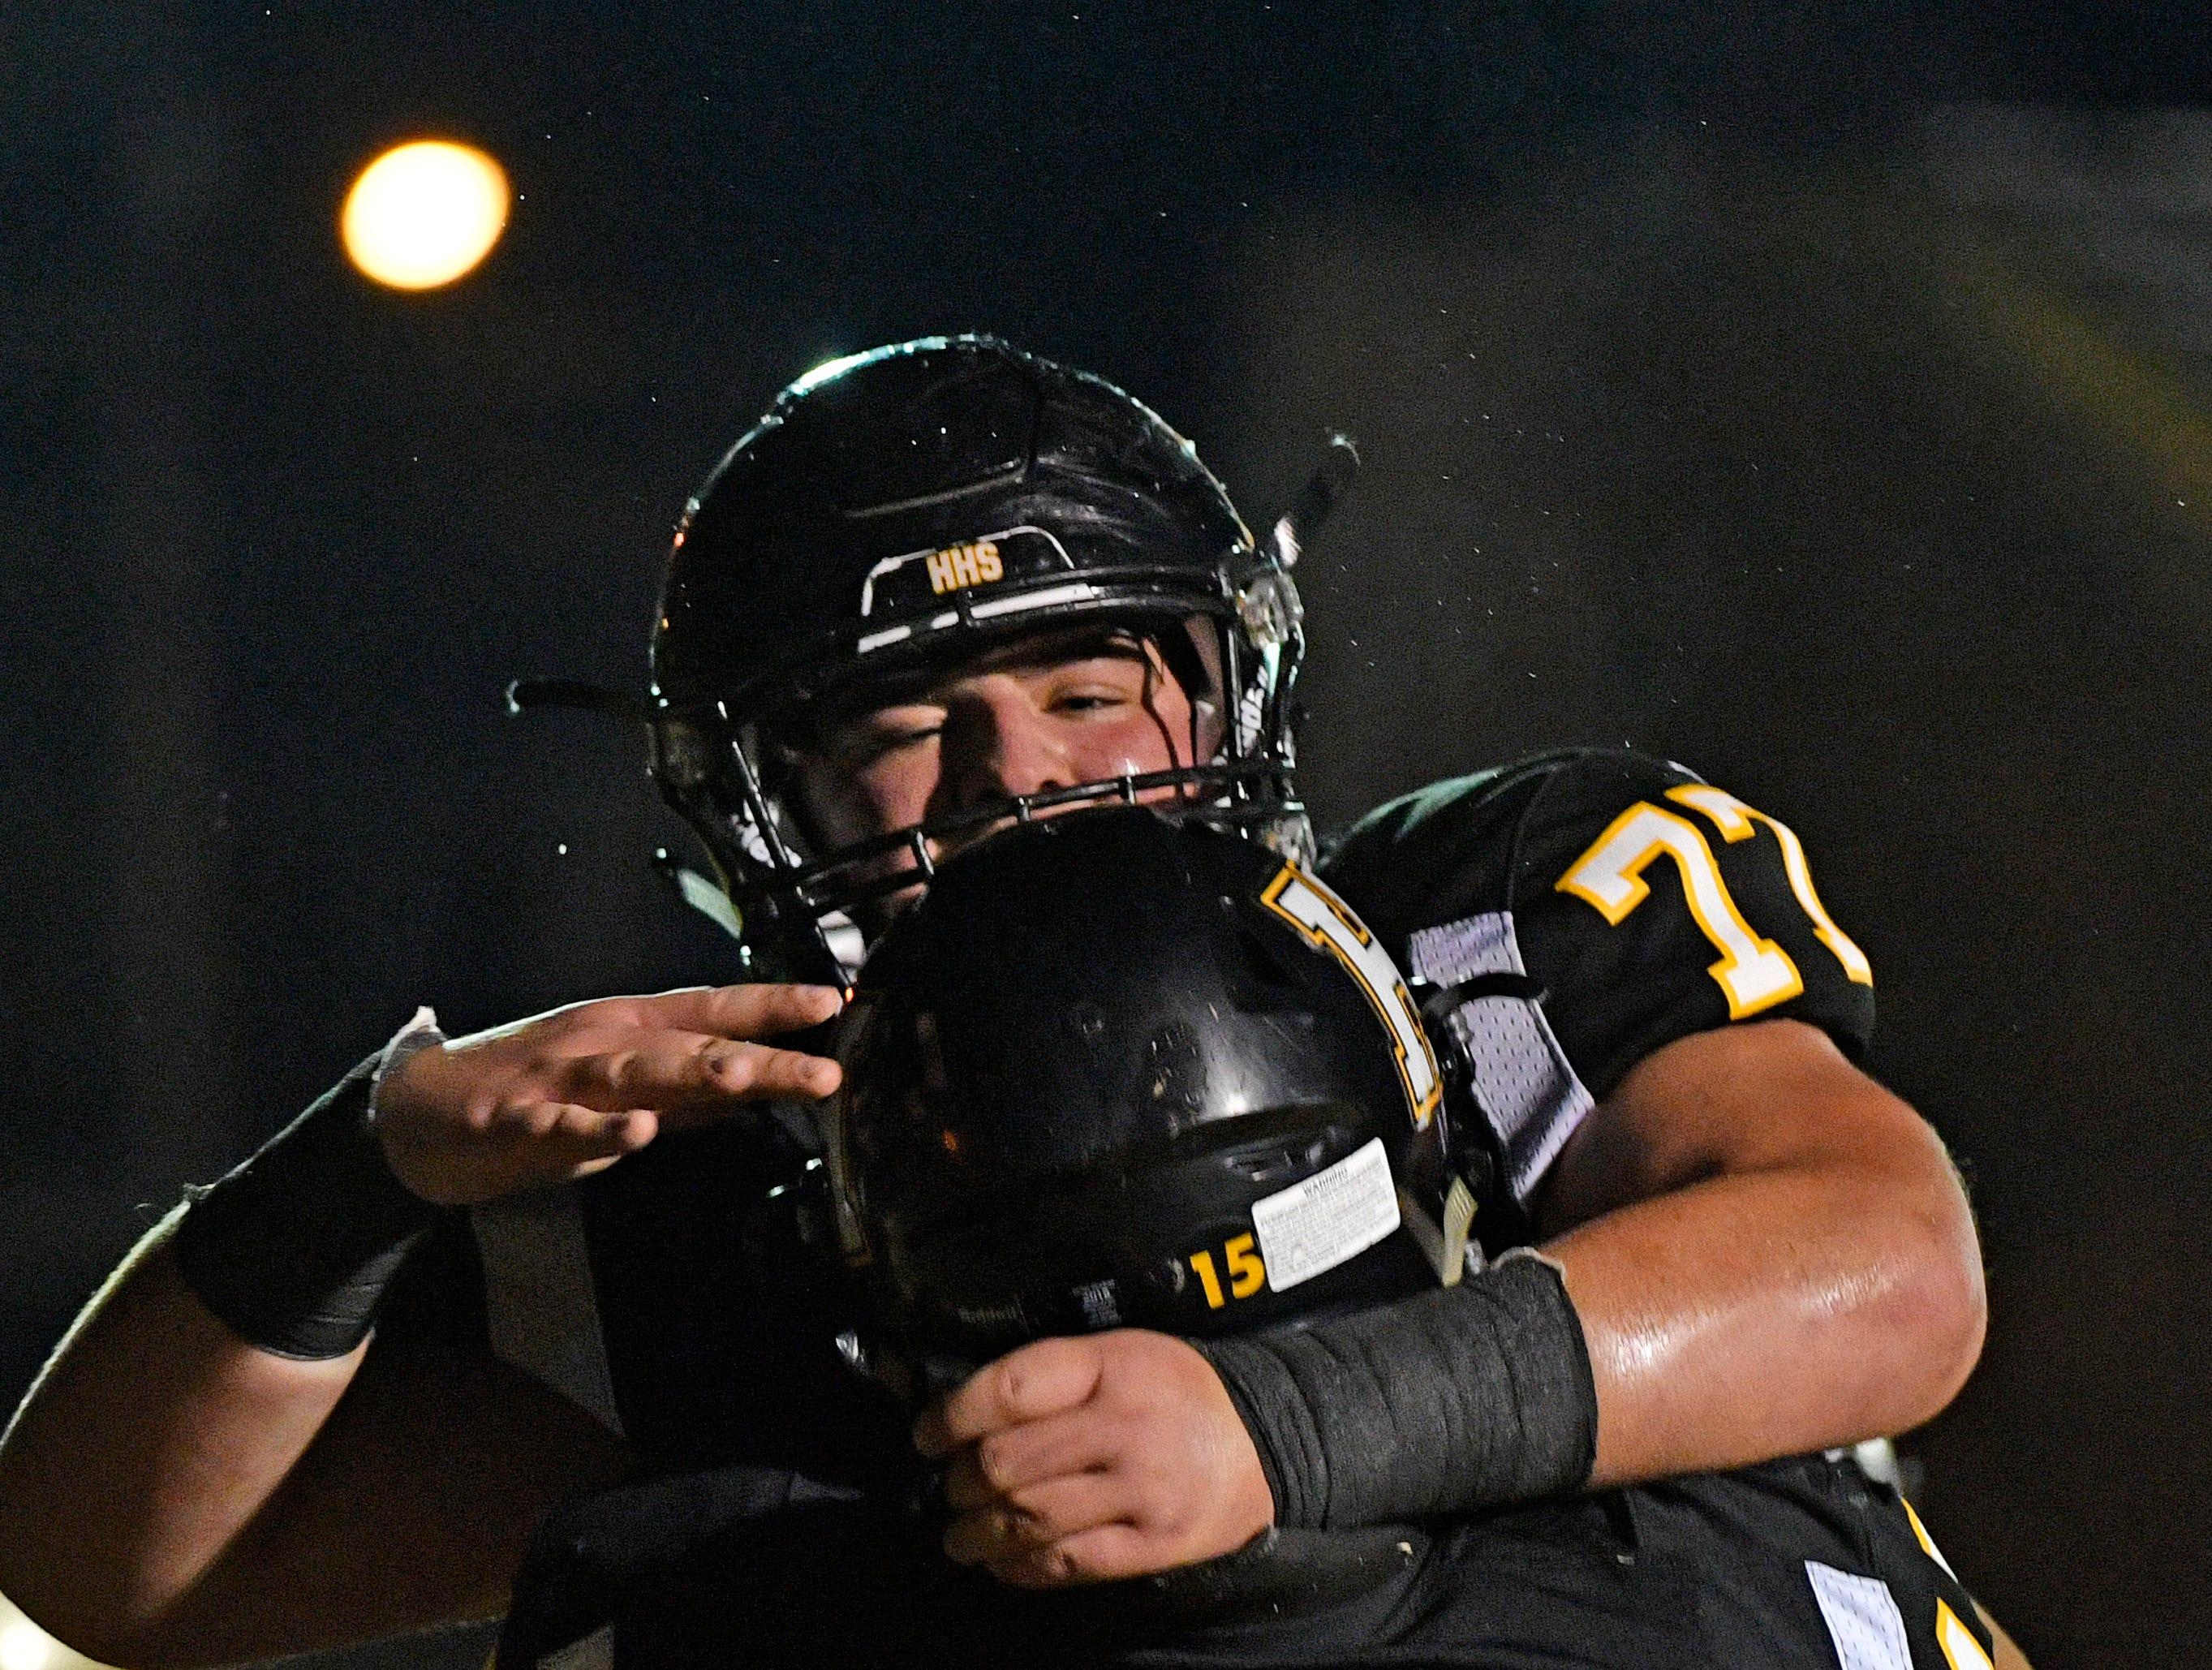 Dalton Jones  is congratulated for his touchdown by teammate Austin Hamblin as Riverdale plays at Hendersonville Friday Nov. 2, 2018, in Hendersonville, Tenn.